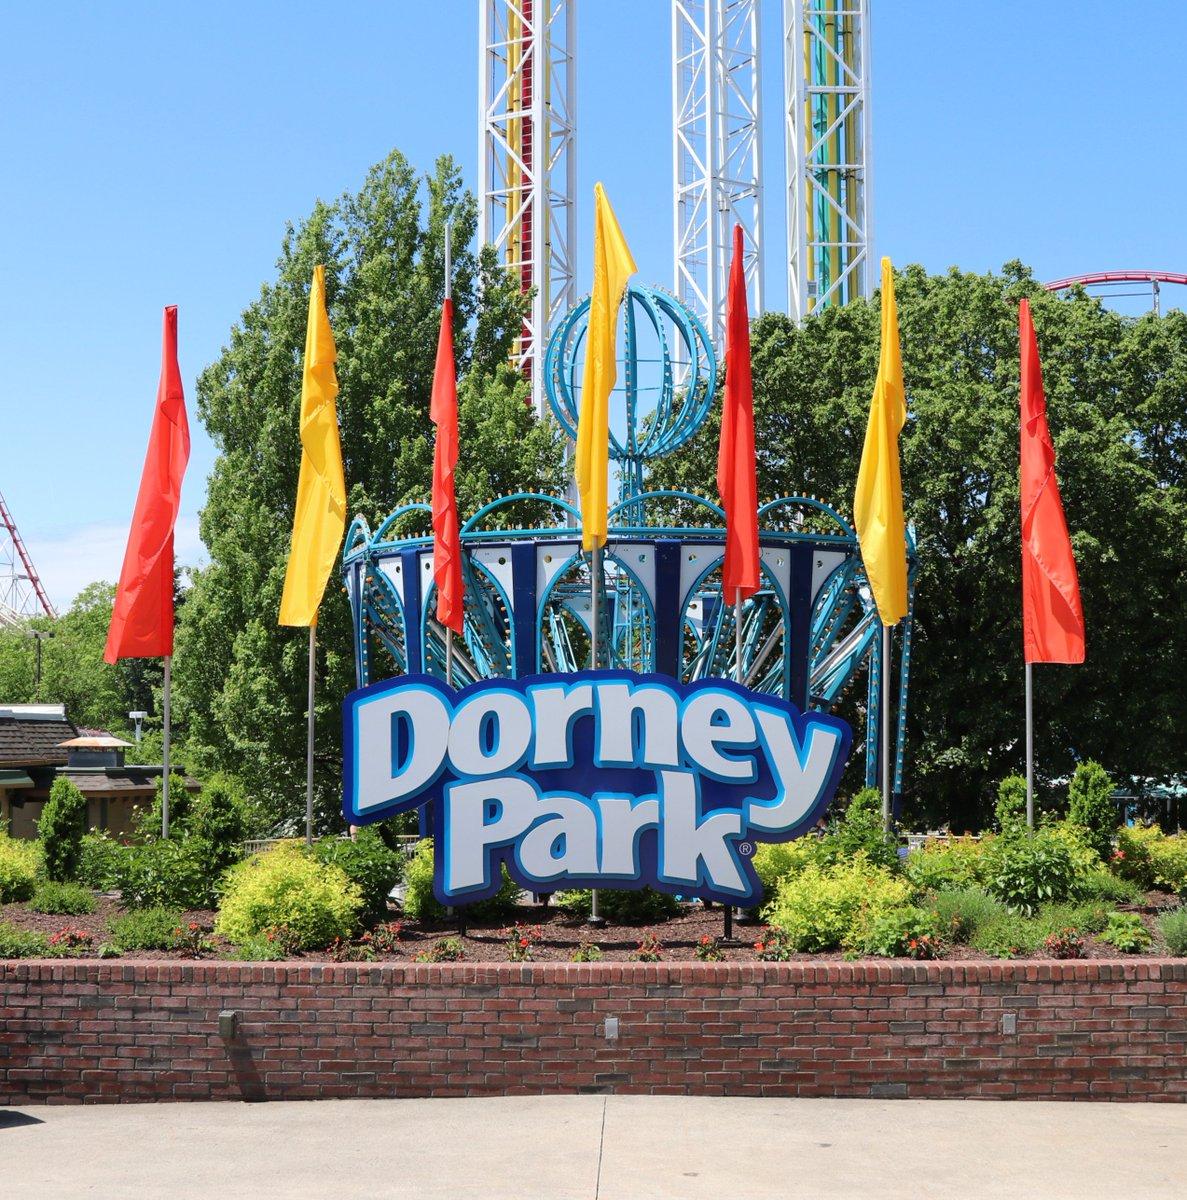 dorney park haunt 2020